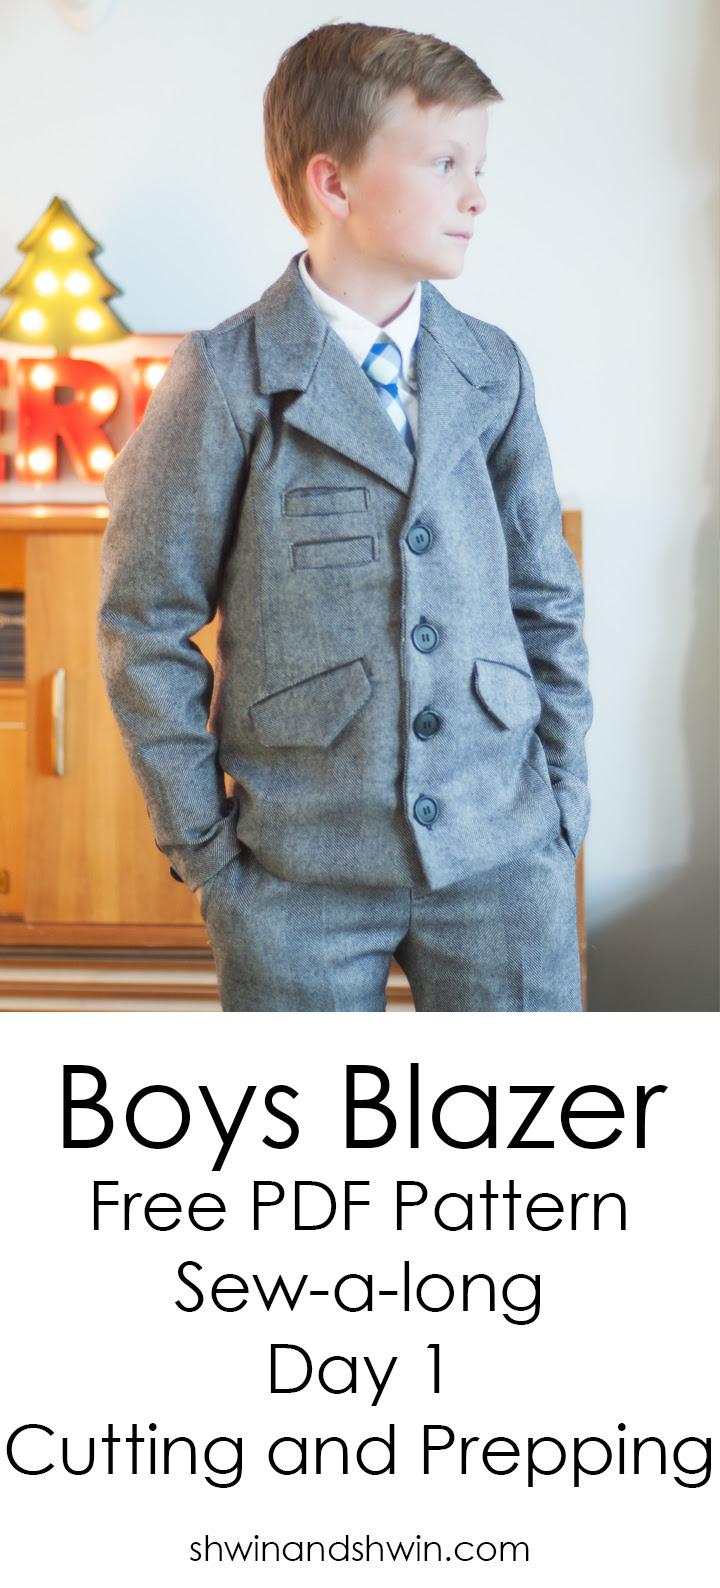 Boys Blazer Pattern Sew-a-long ||FREE PDF Pattern || Cutting and Prepping